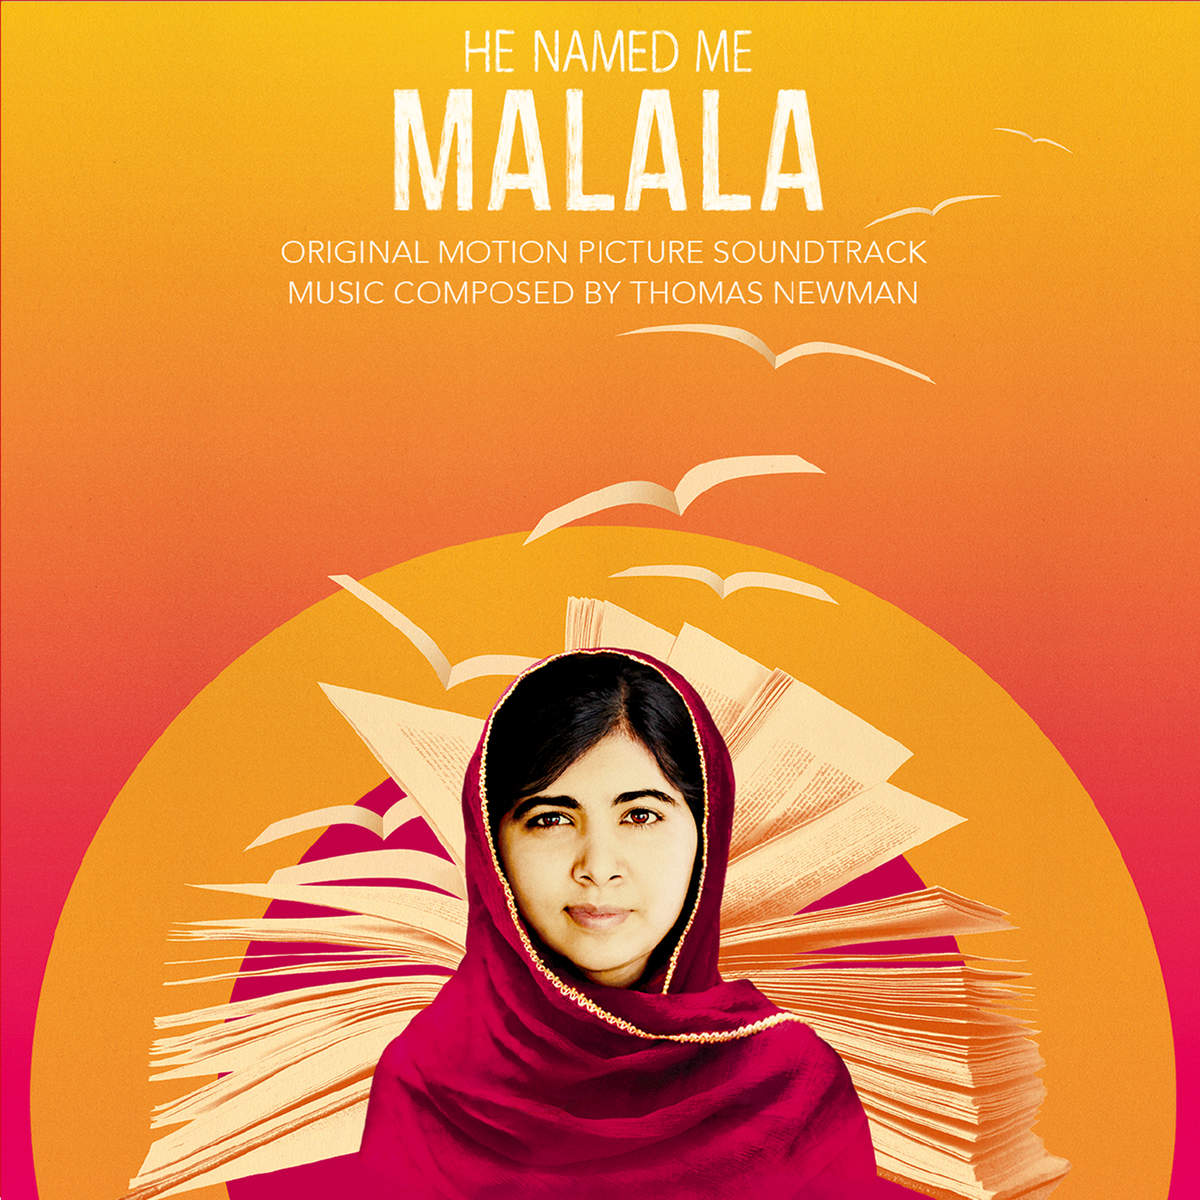 He Named Me Malala - 2015